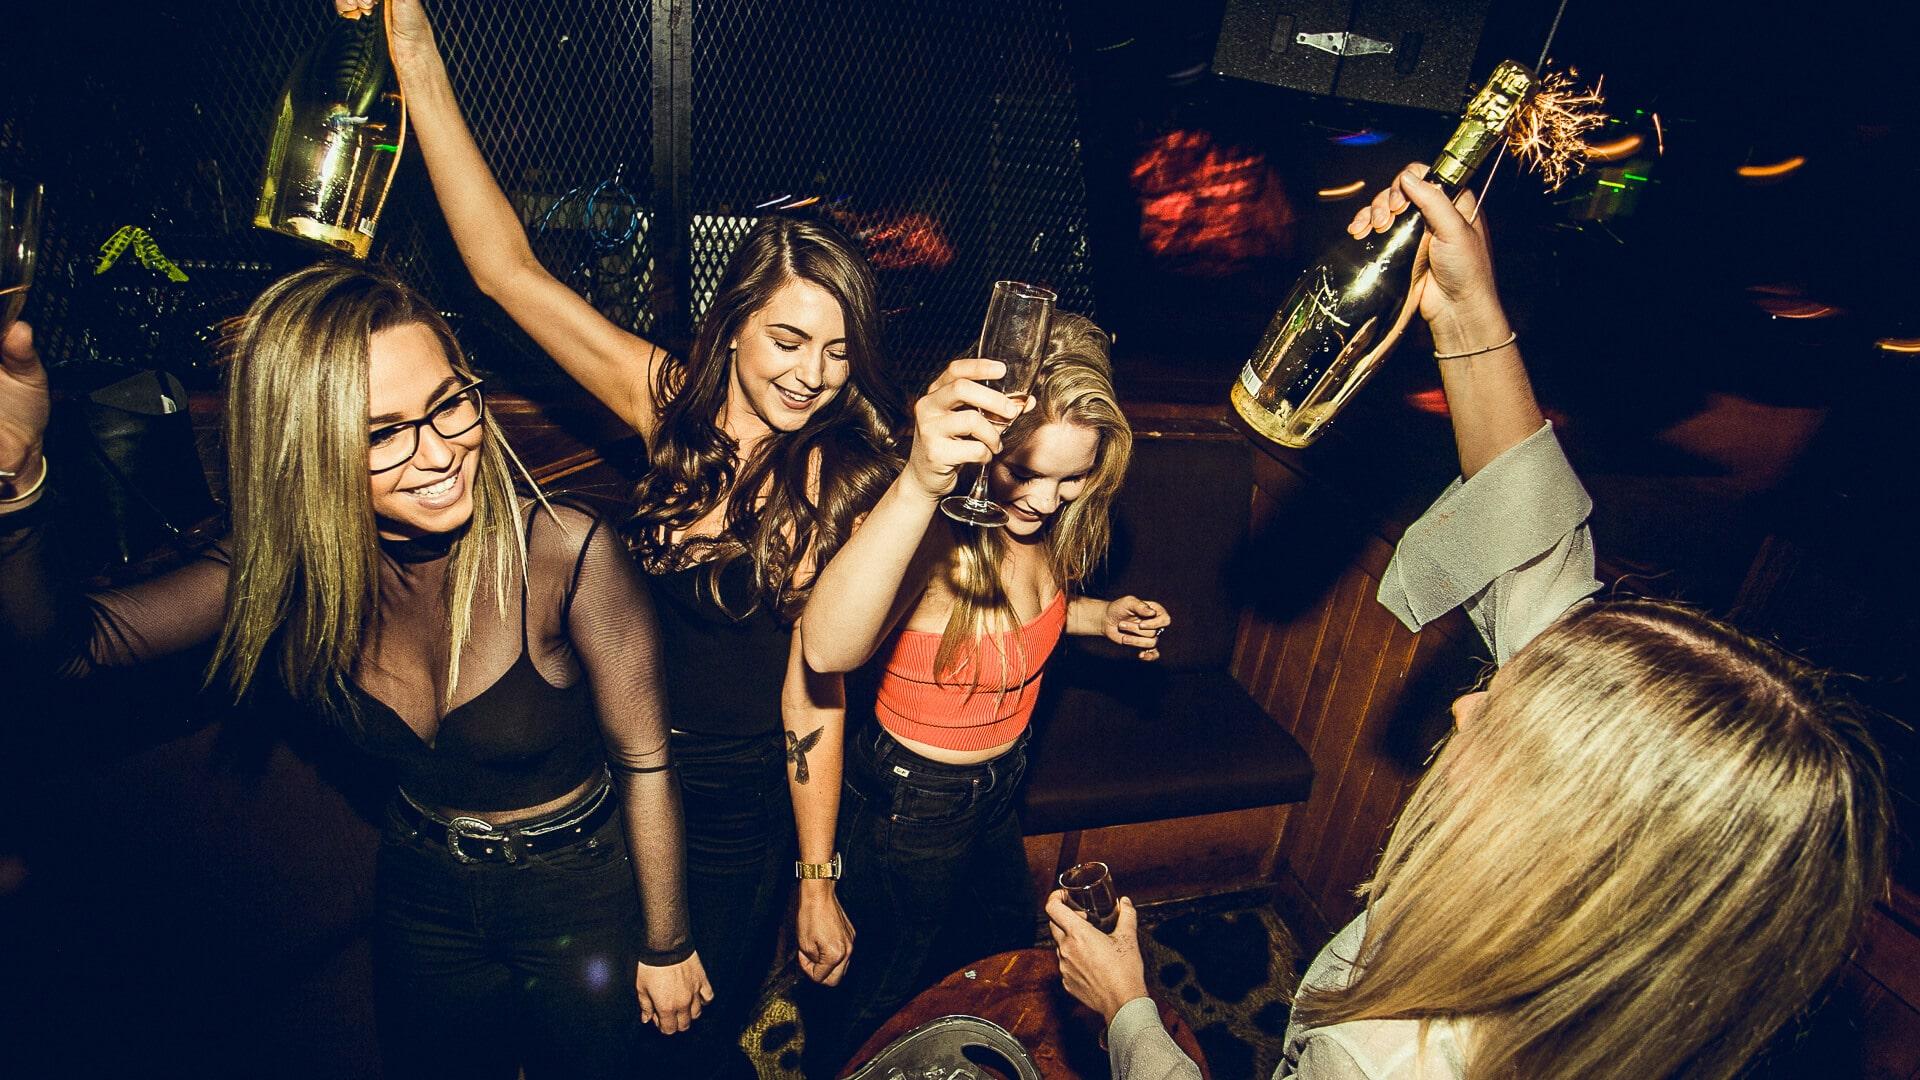 Women party at a bar